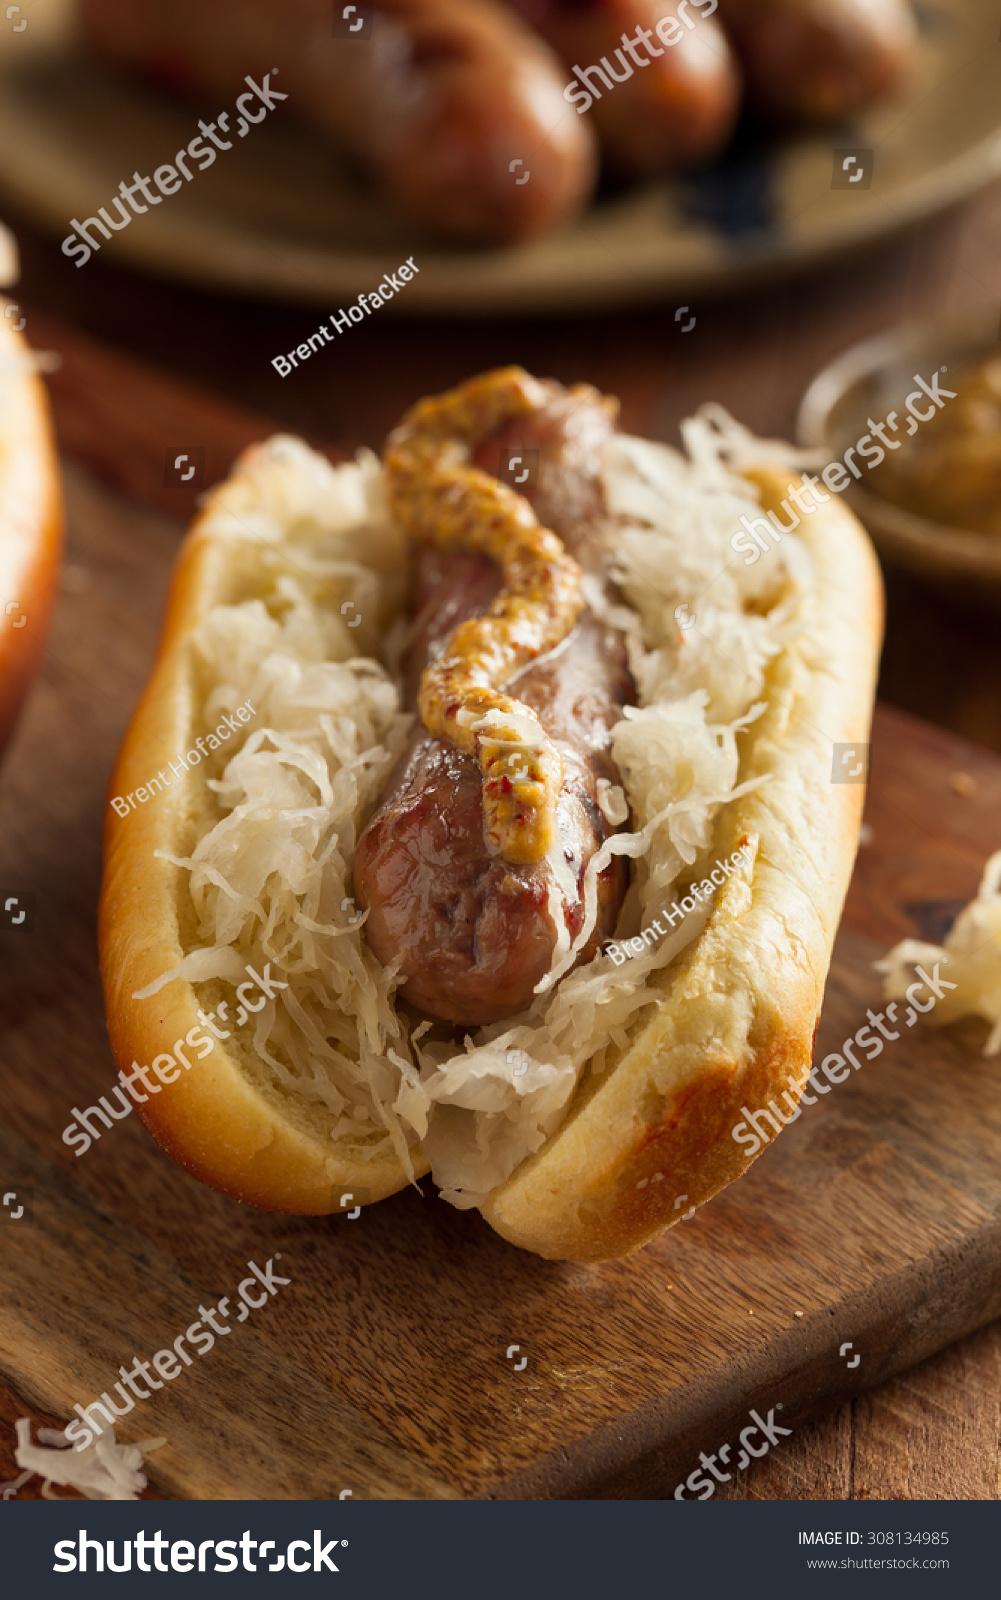 Beer Bratwurst With Sauerkraut And Spicy Mustard Stock Photo 308134985 ...